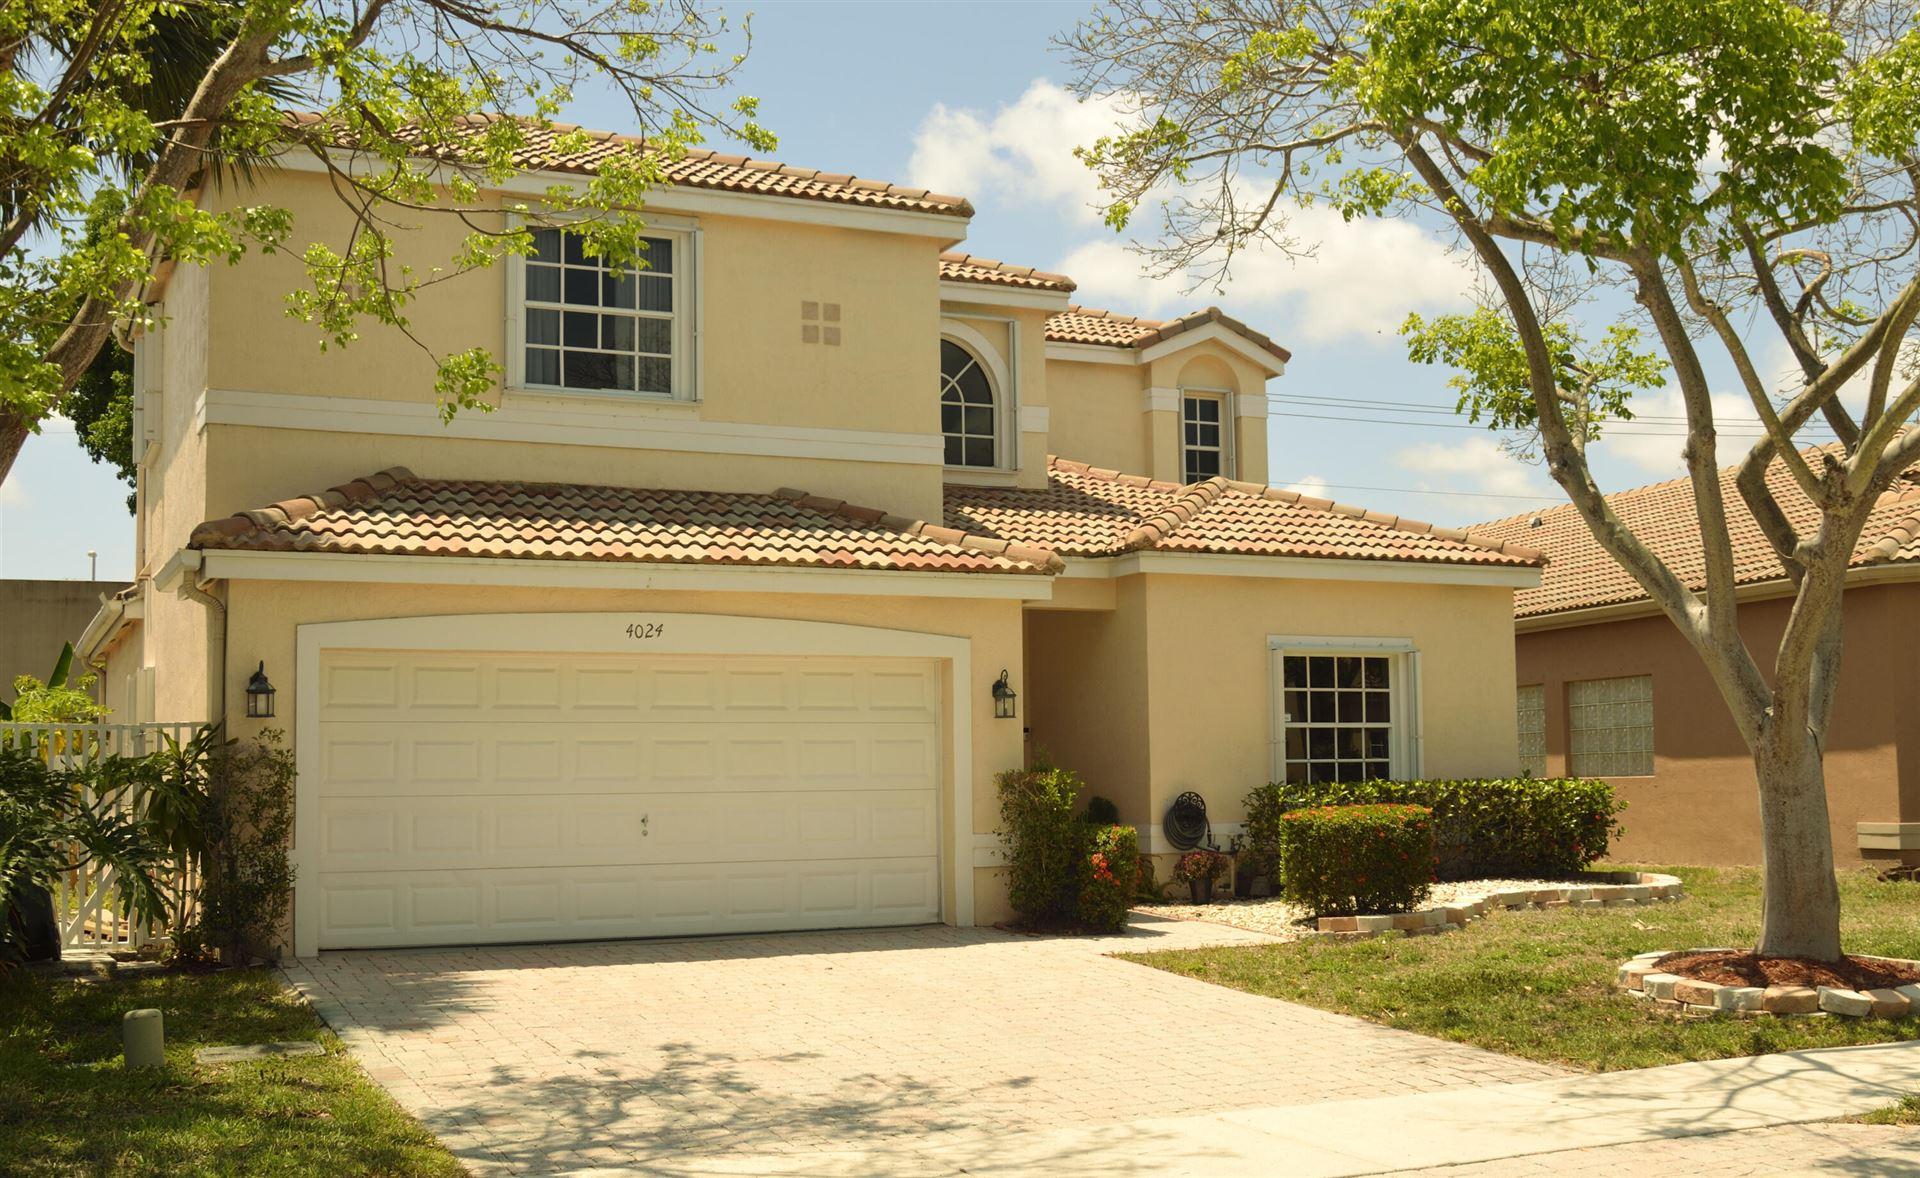 4024 NW 62nd Court, Coconut Creek, FL 33073 - MLS#: RX-10713517